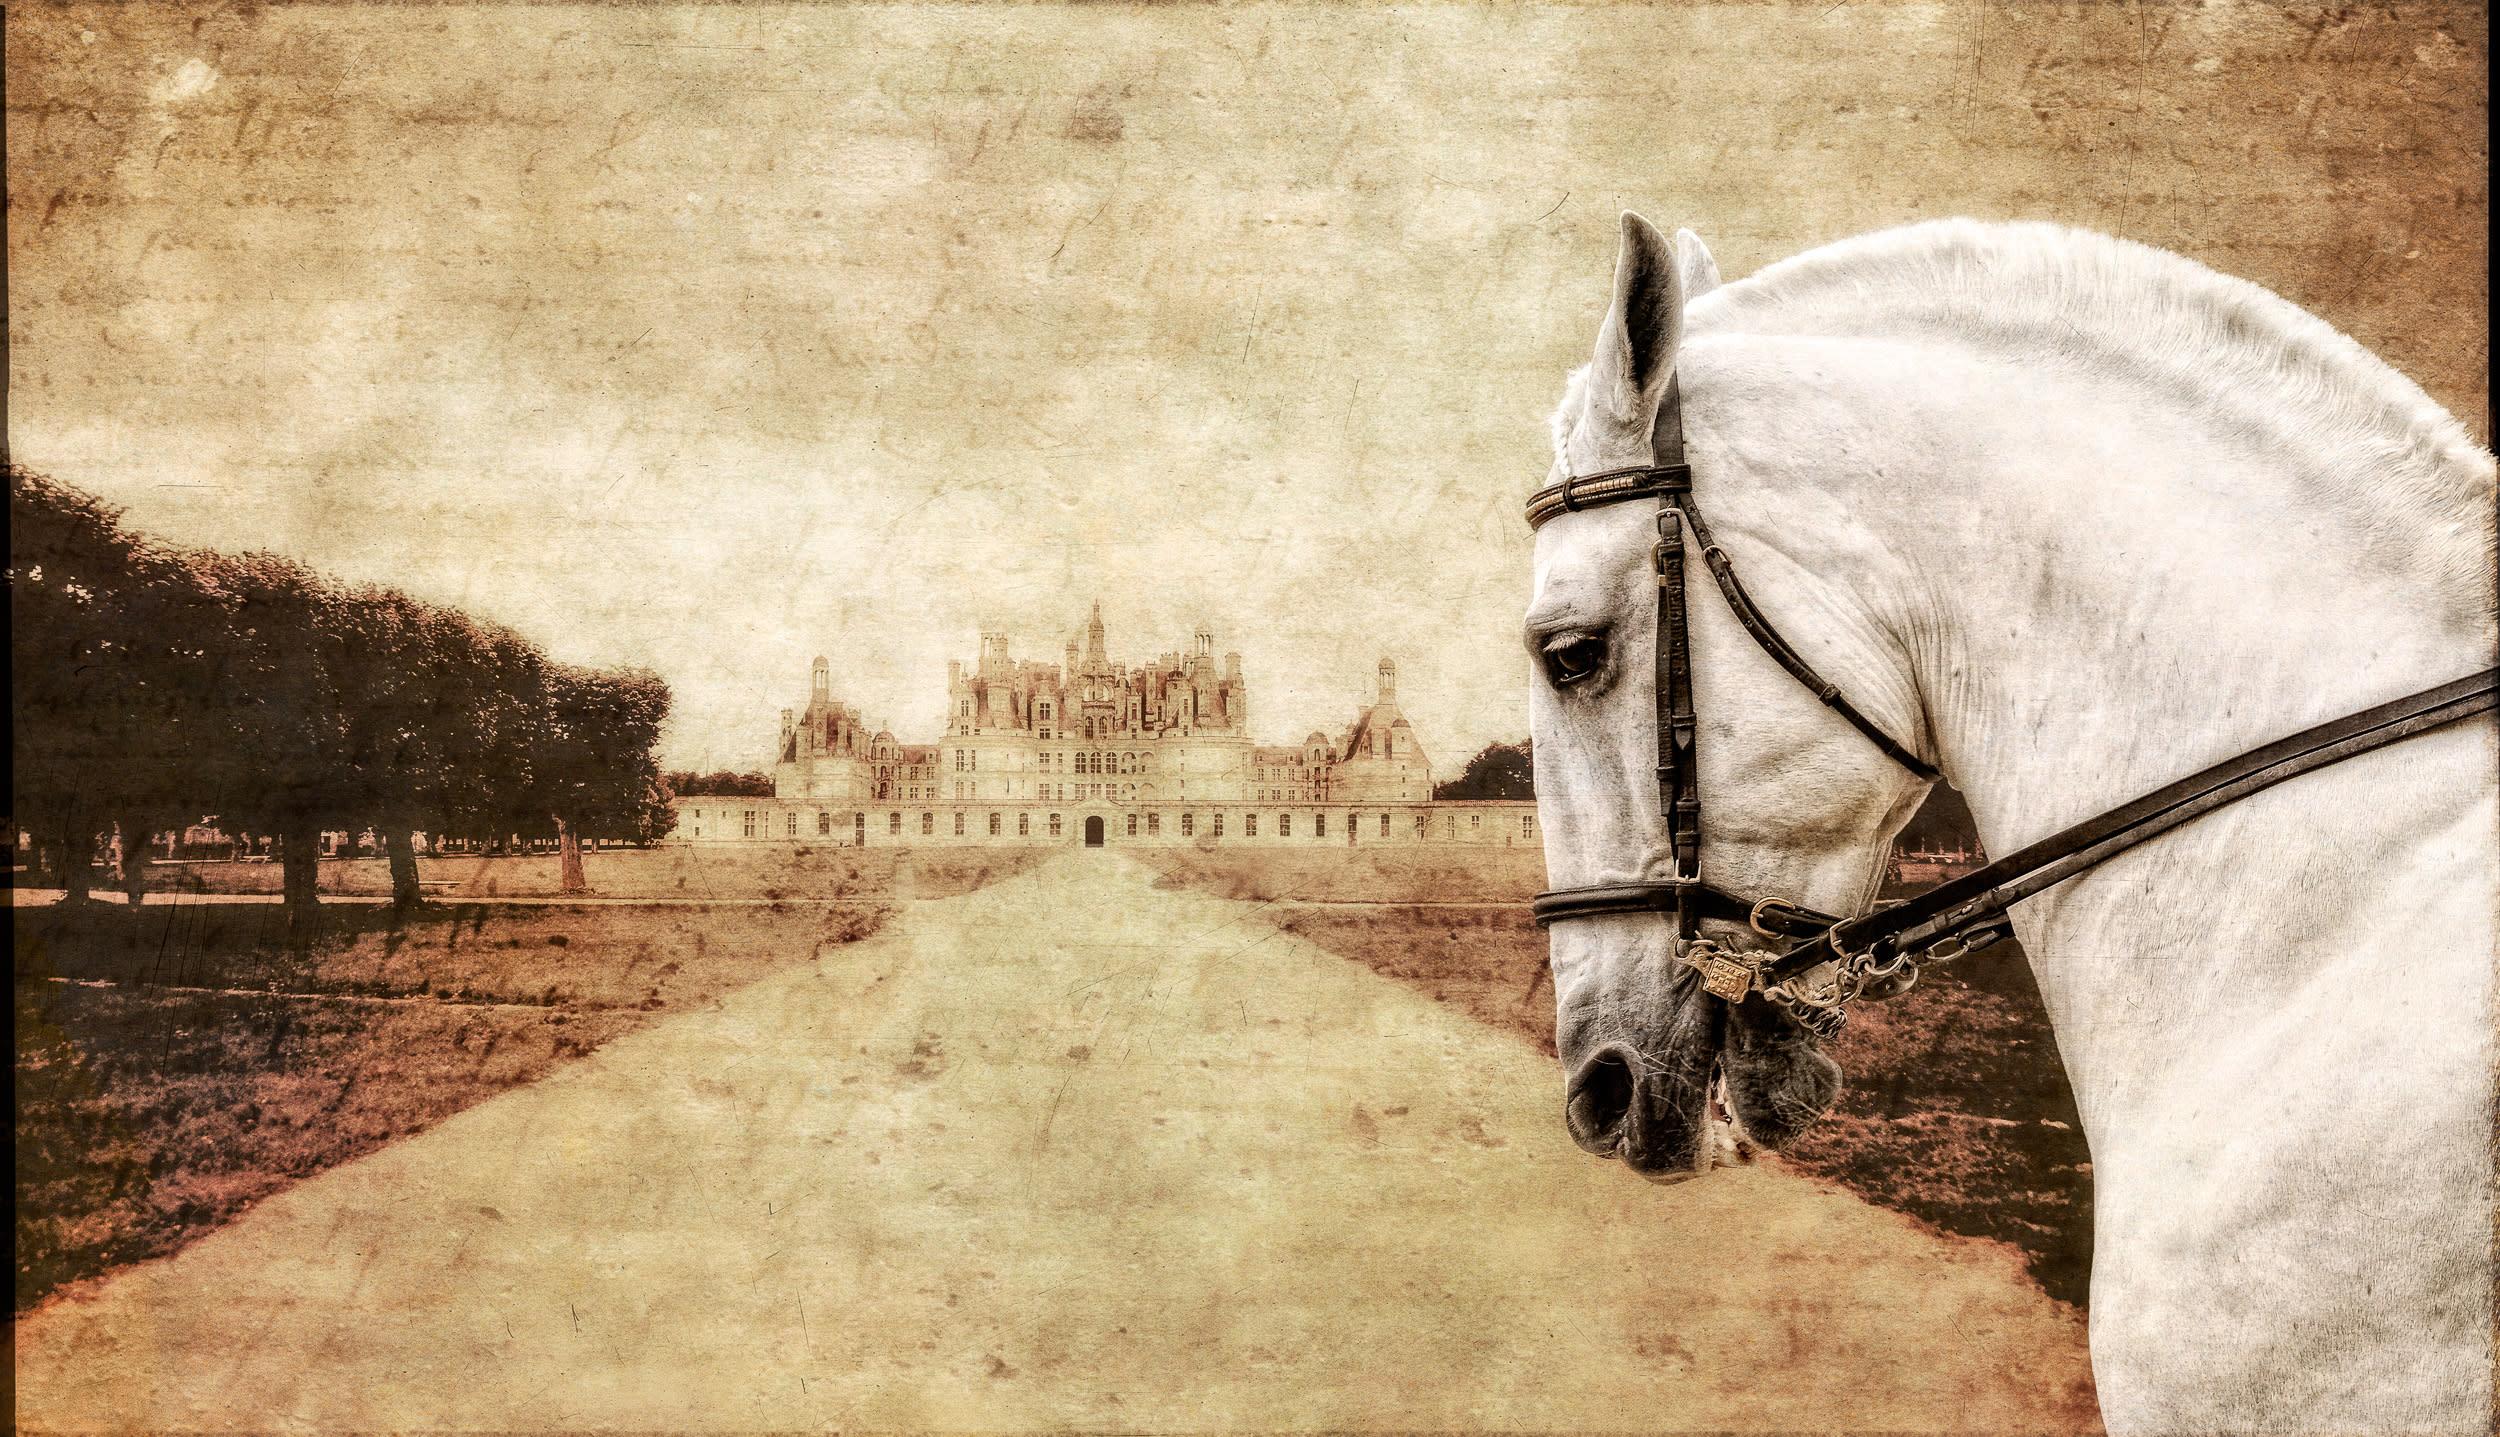 Royal stallion wlsg7m